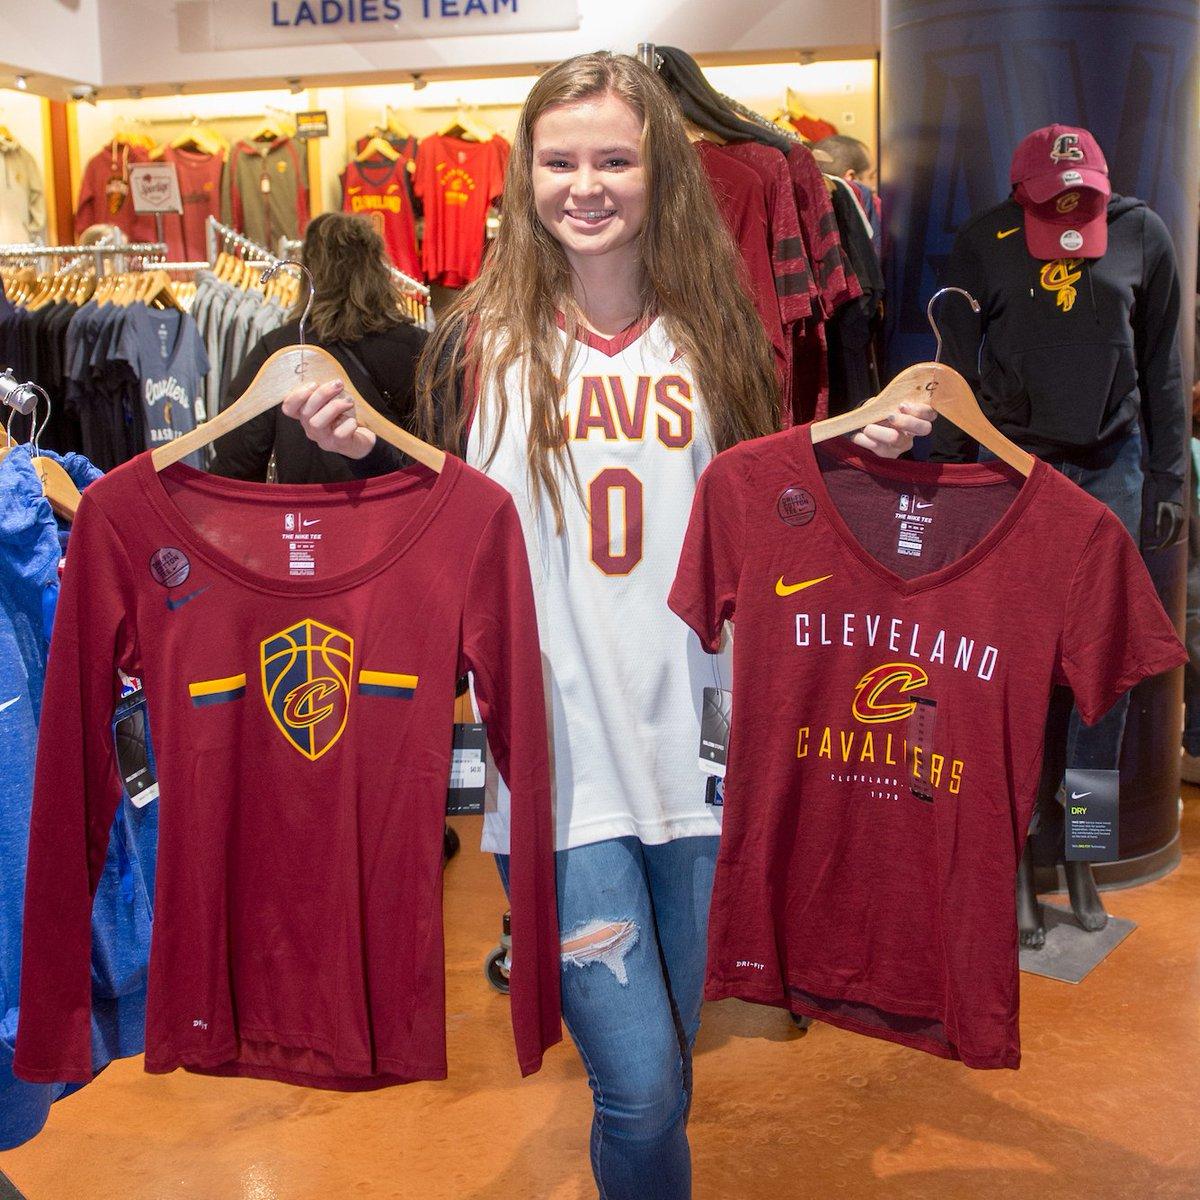 0c88c1f1a38d Cavaliers Team Shop on Twitter